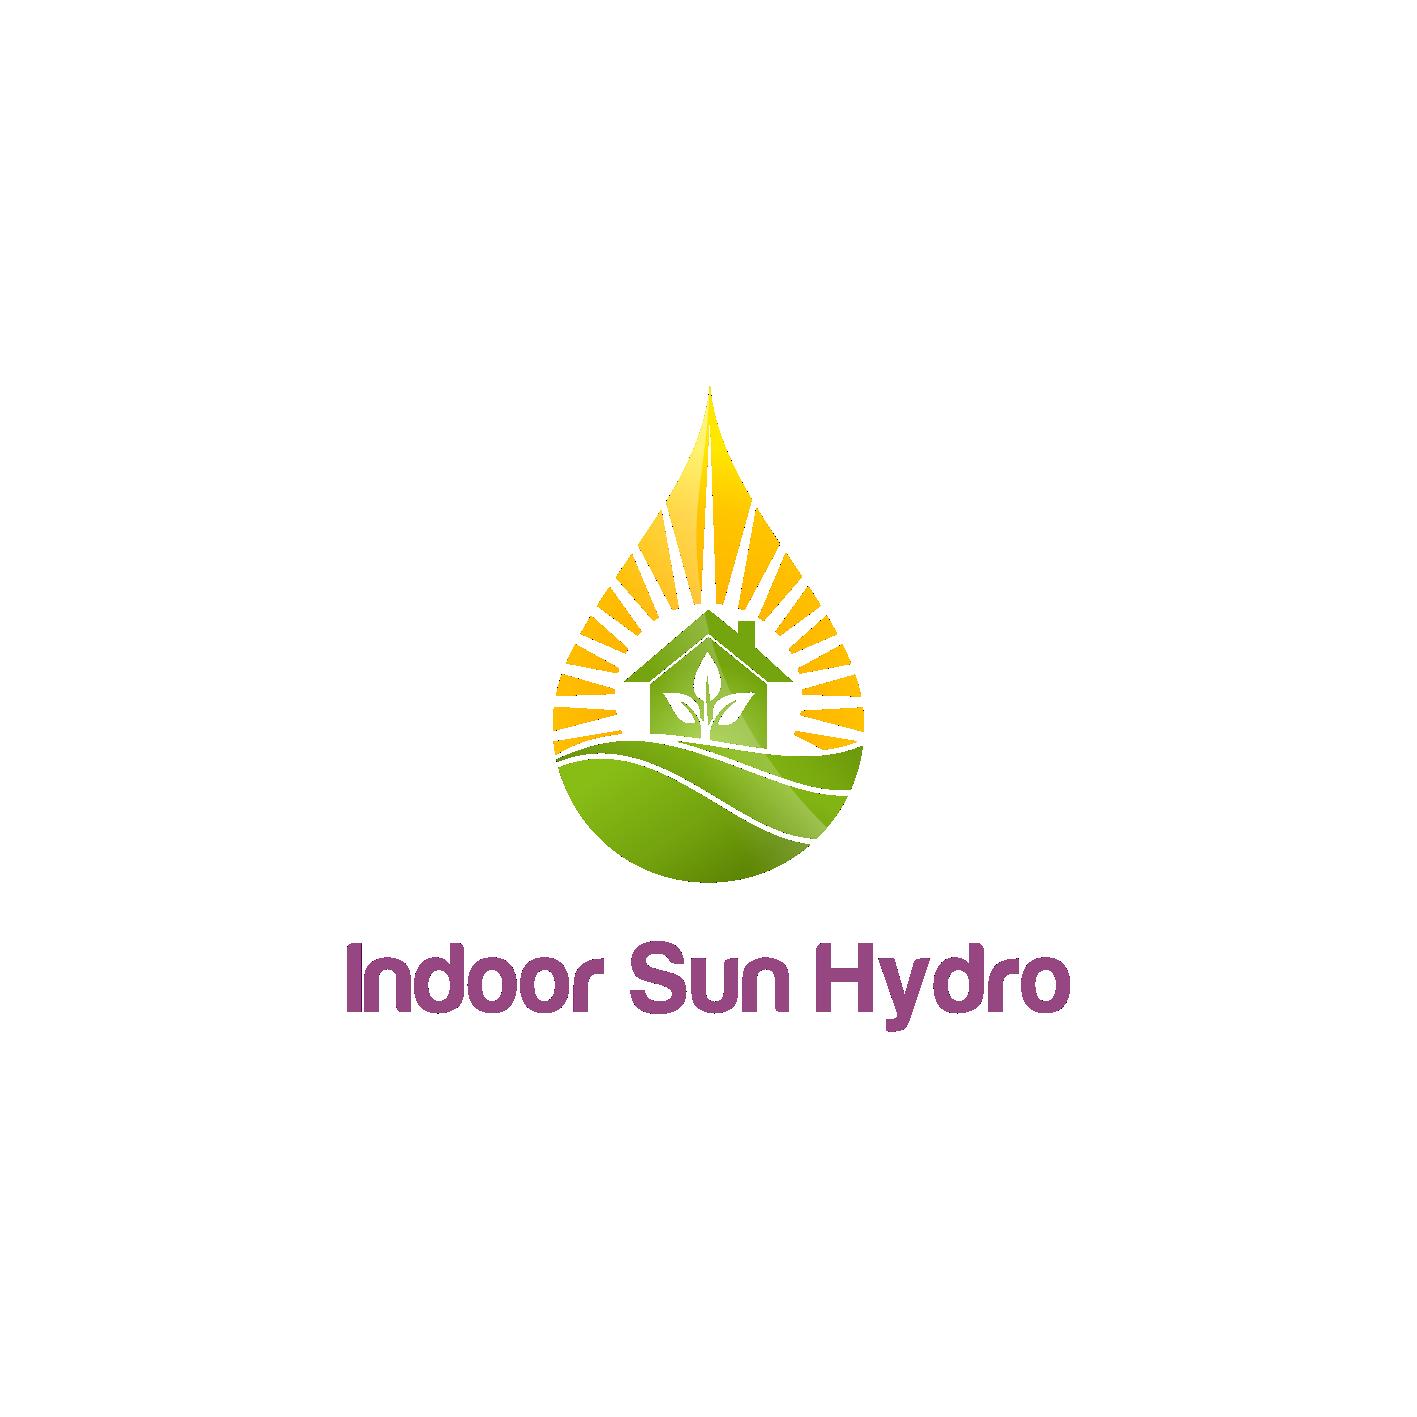 Indoor Sun Hydro